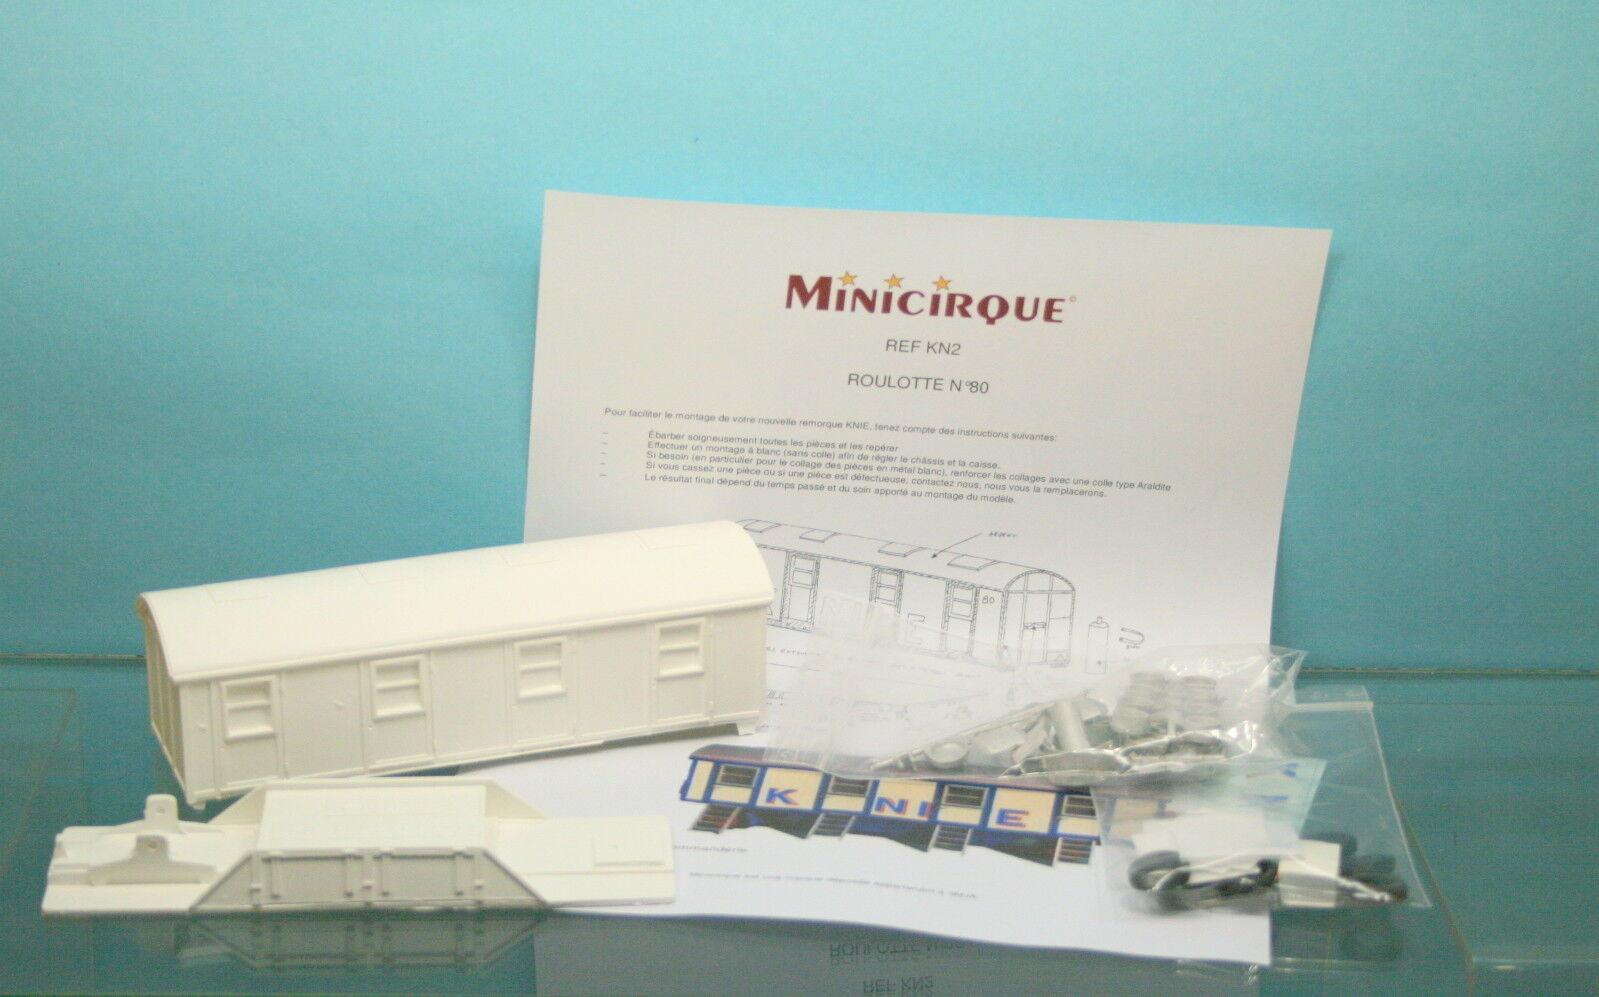 MINICIRQUE - CIRQUE KNIE -  KIT A CONSTRUIRE ROULOTTE N°80 - REF  KN2 - 1 50